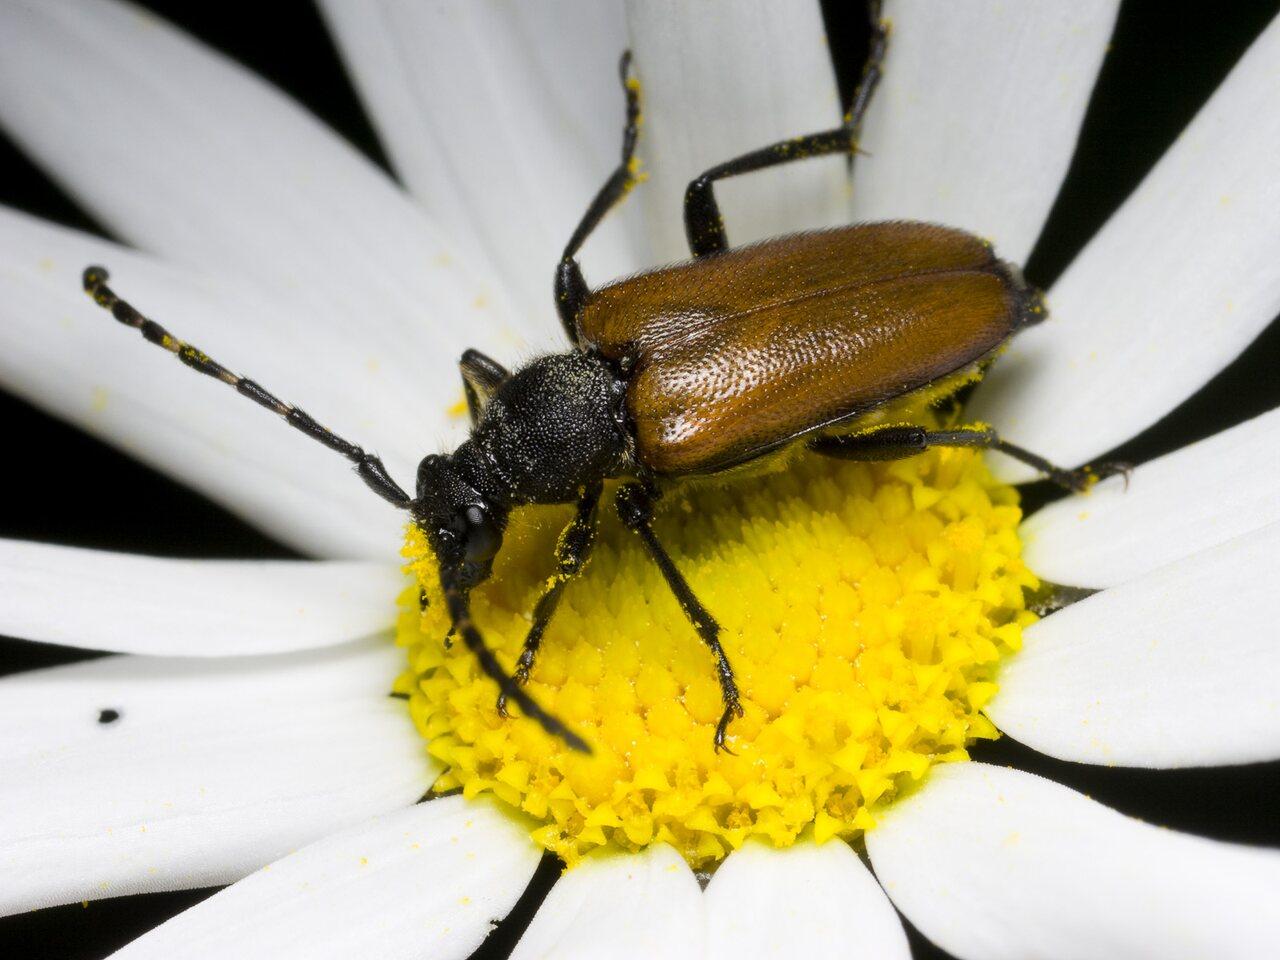 Paracorymbia-maculicornis-0397.jpg